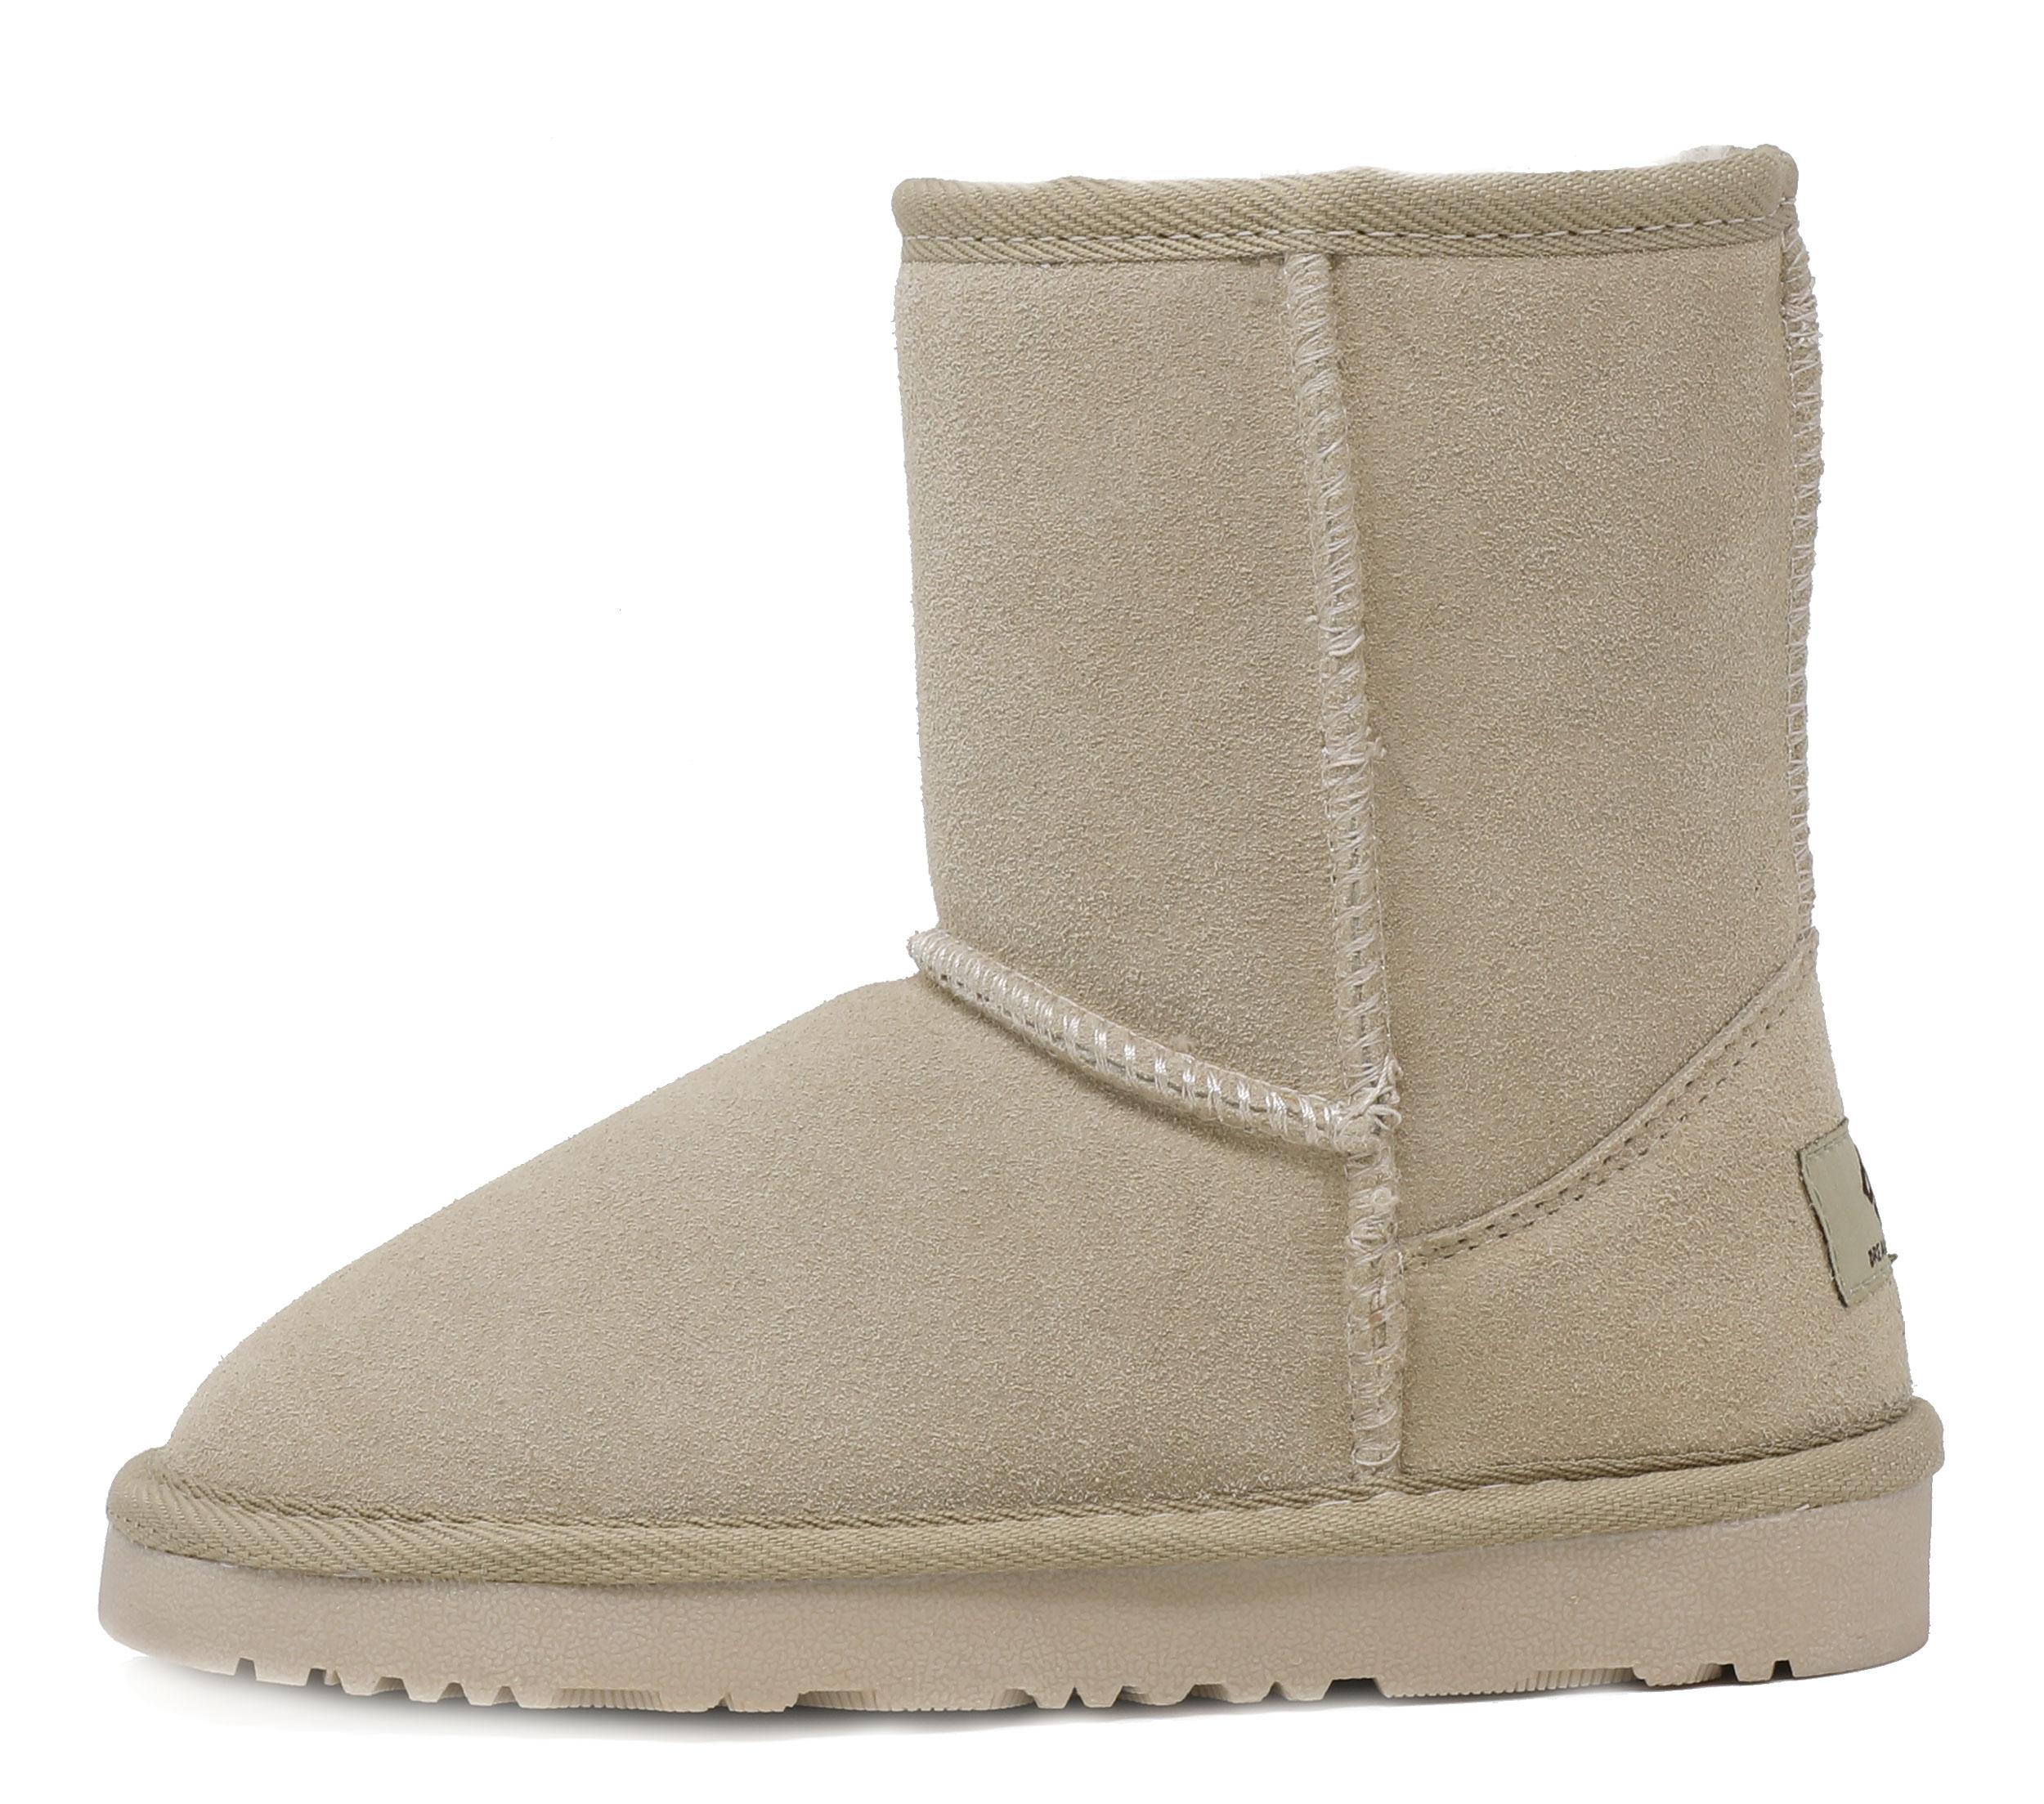 5dd754dc3ea Details about DREAM PAIRS Boys Girls Toddler/ Kids Shorty-k Winter Snow  Sheepskin Fur Boots